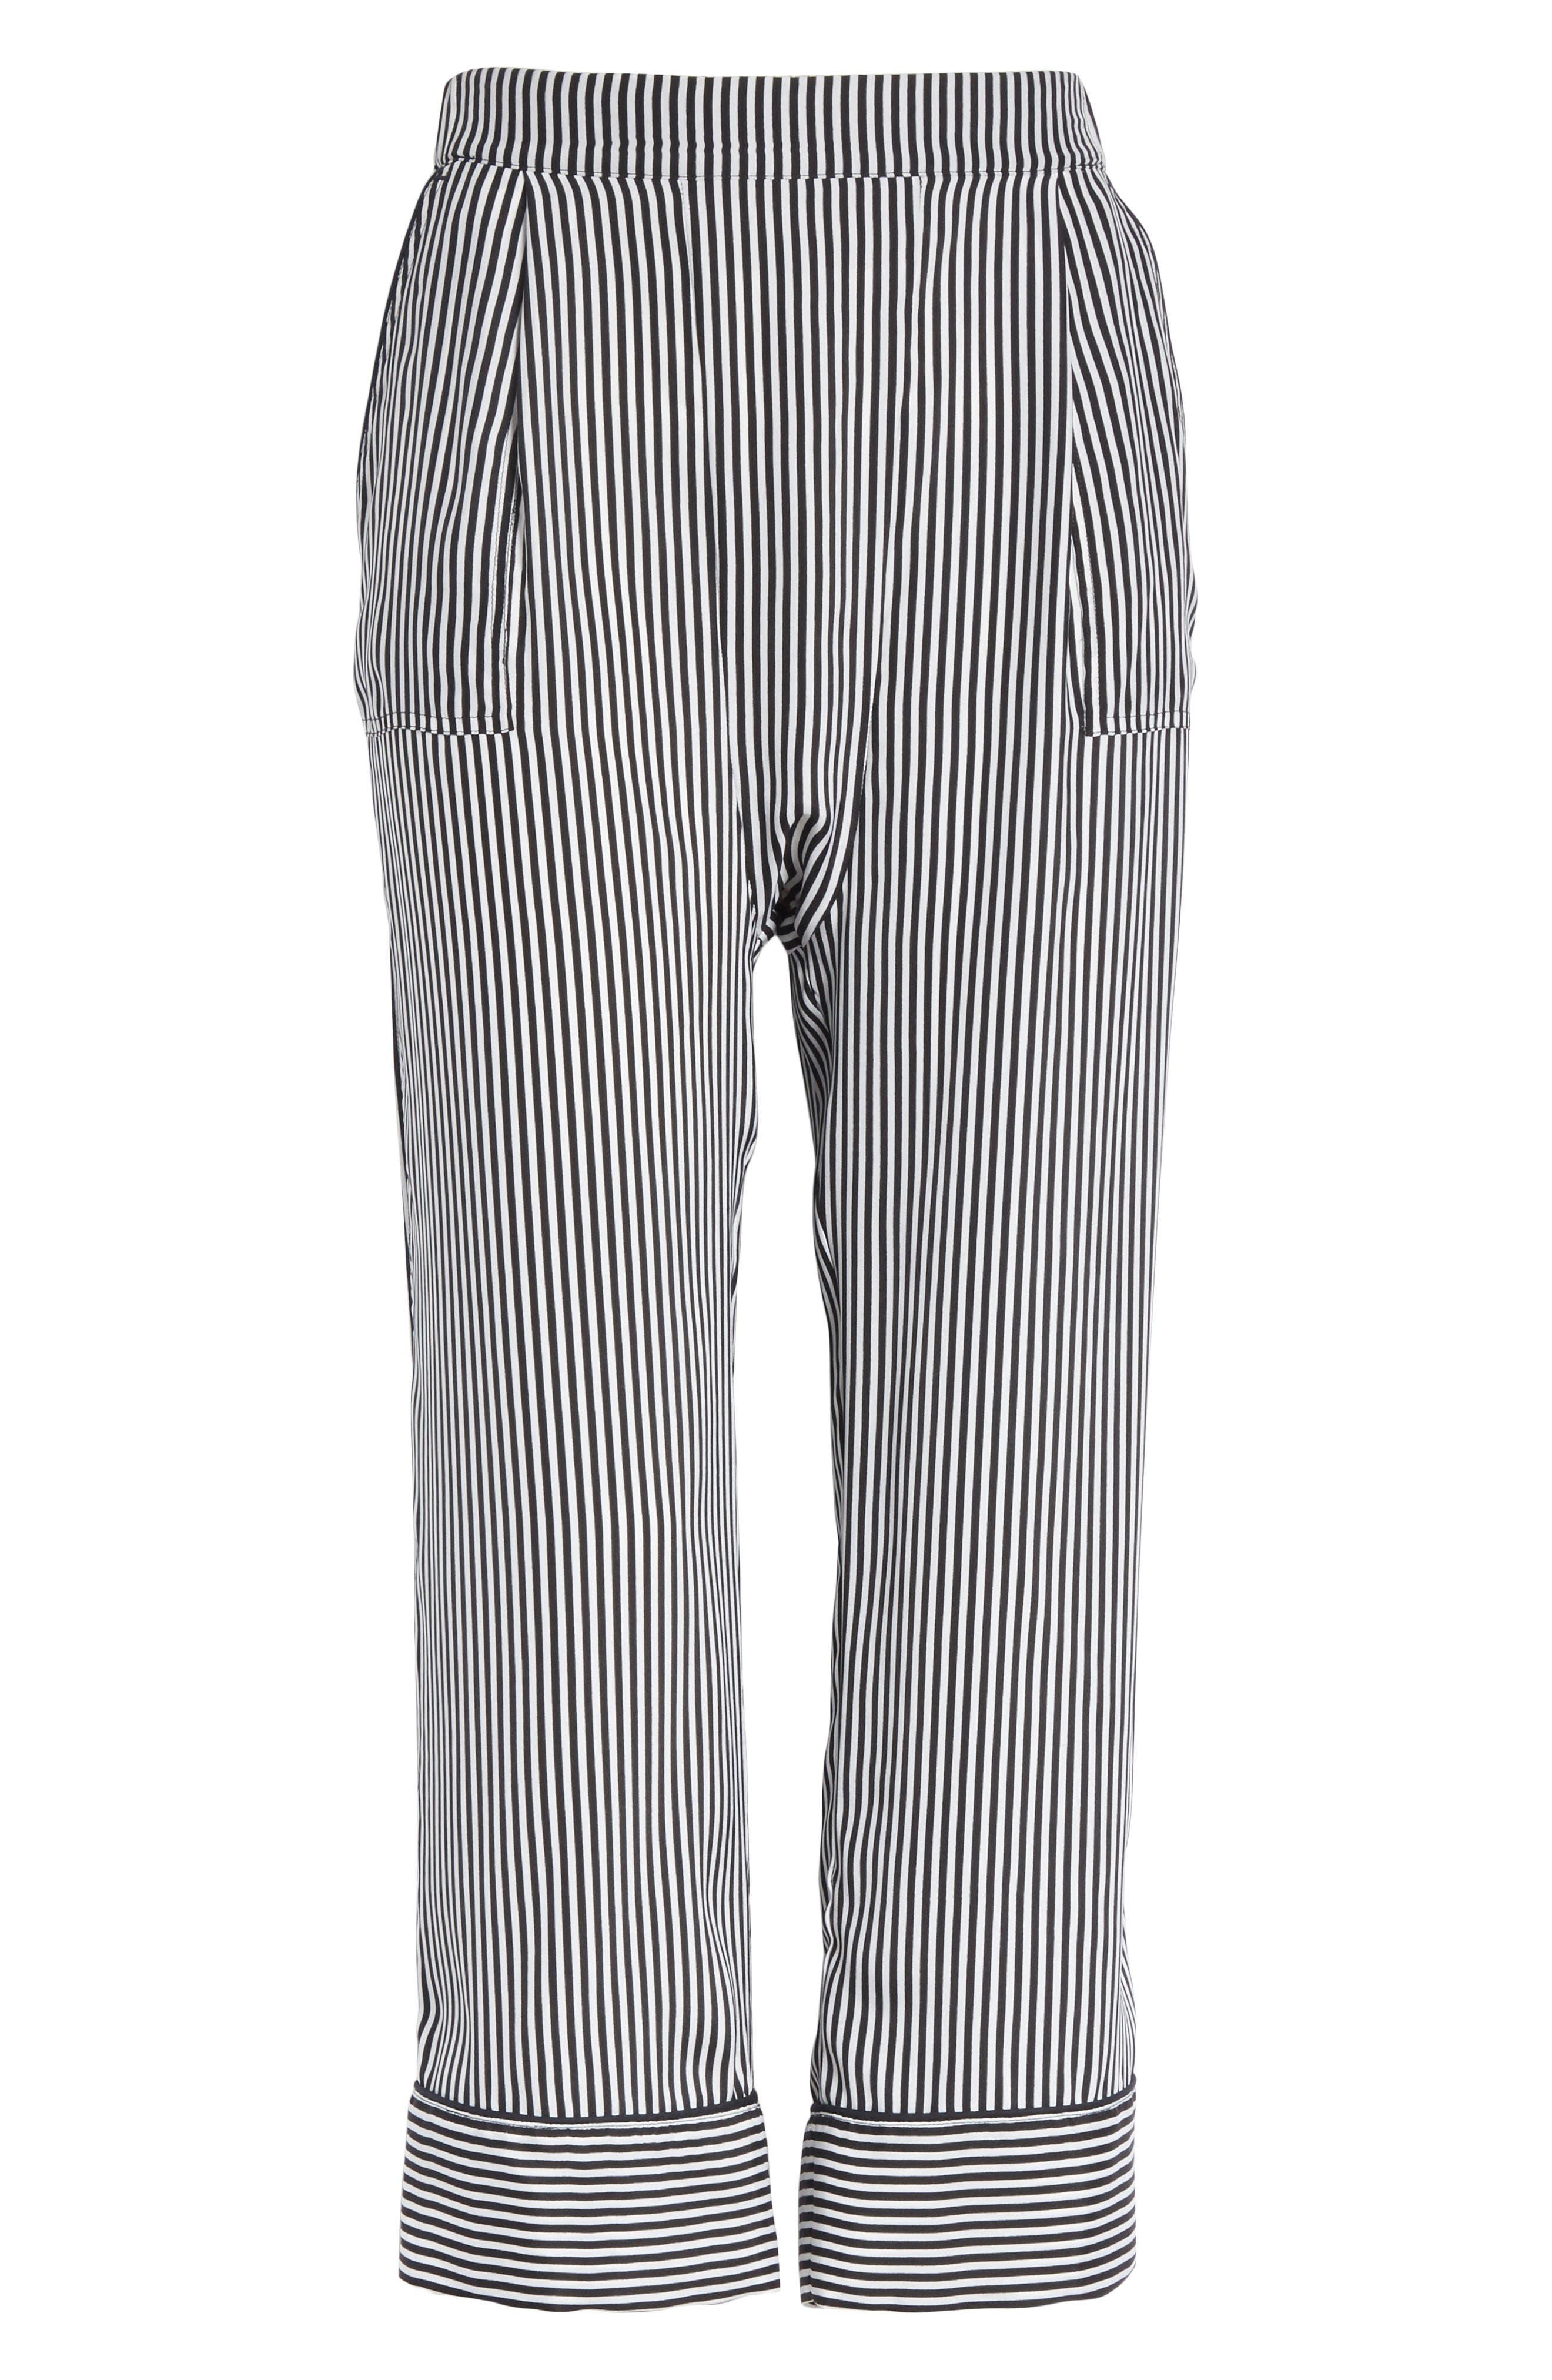 Pencil Stripe Silk Pajama Trousers,                             Alternate thumbnail 10, color,                             Pencil Stripe